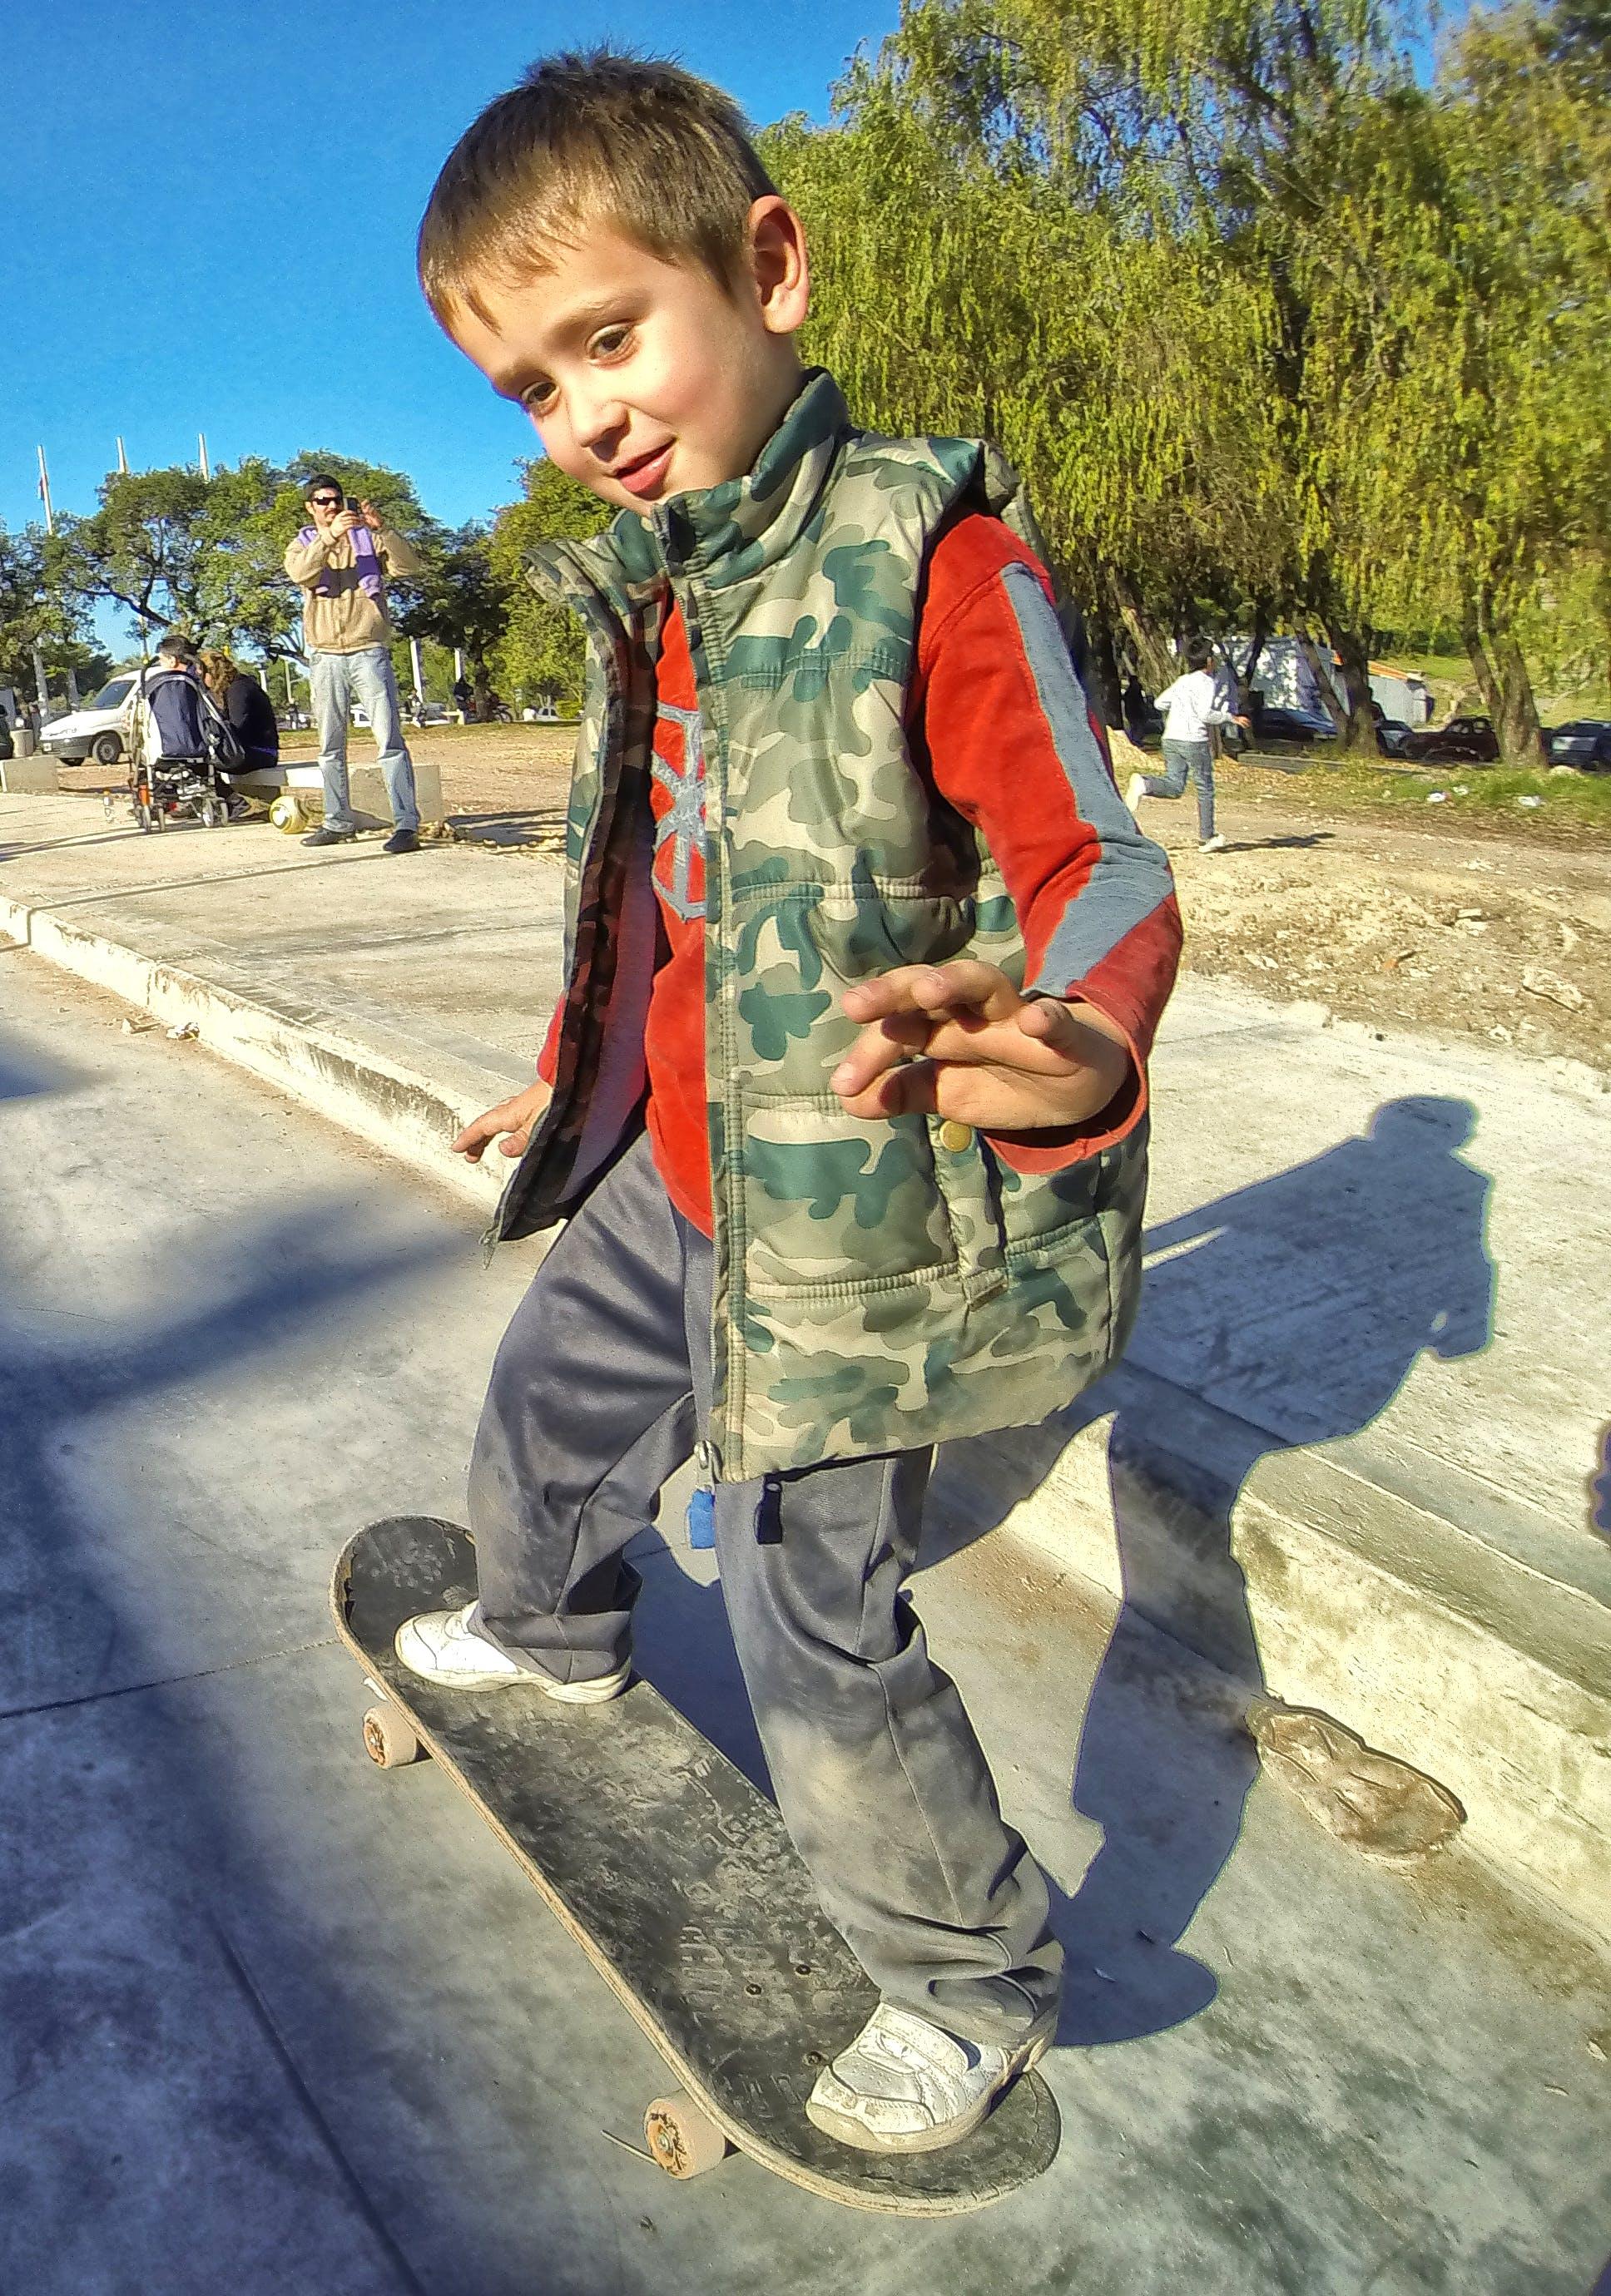 Free stock photo of Juan, skate